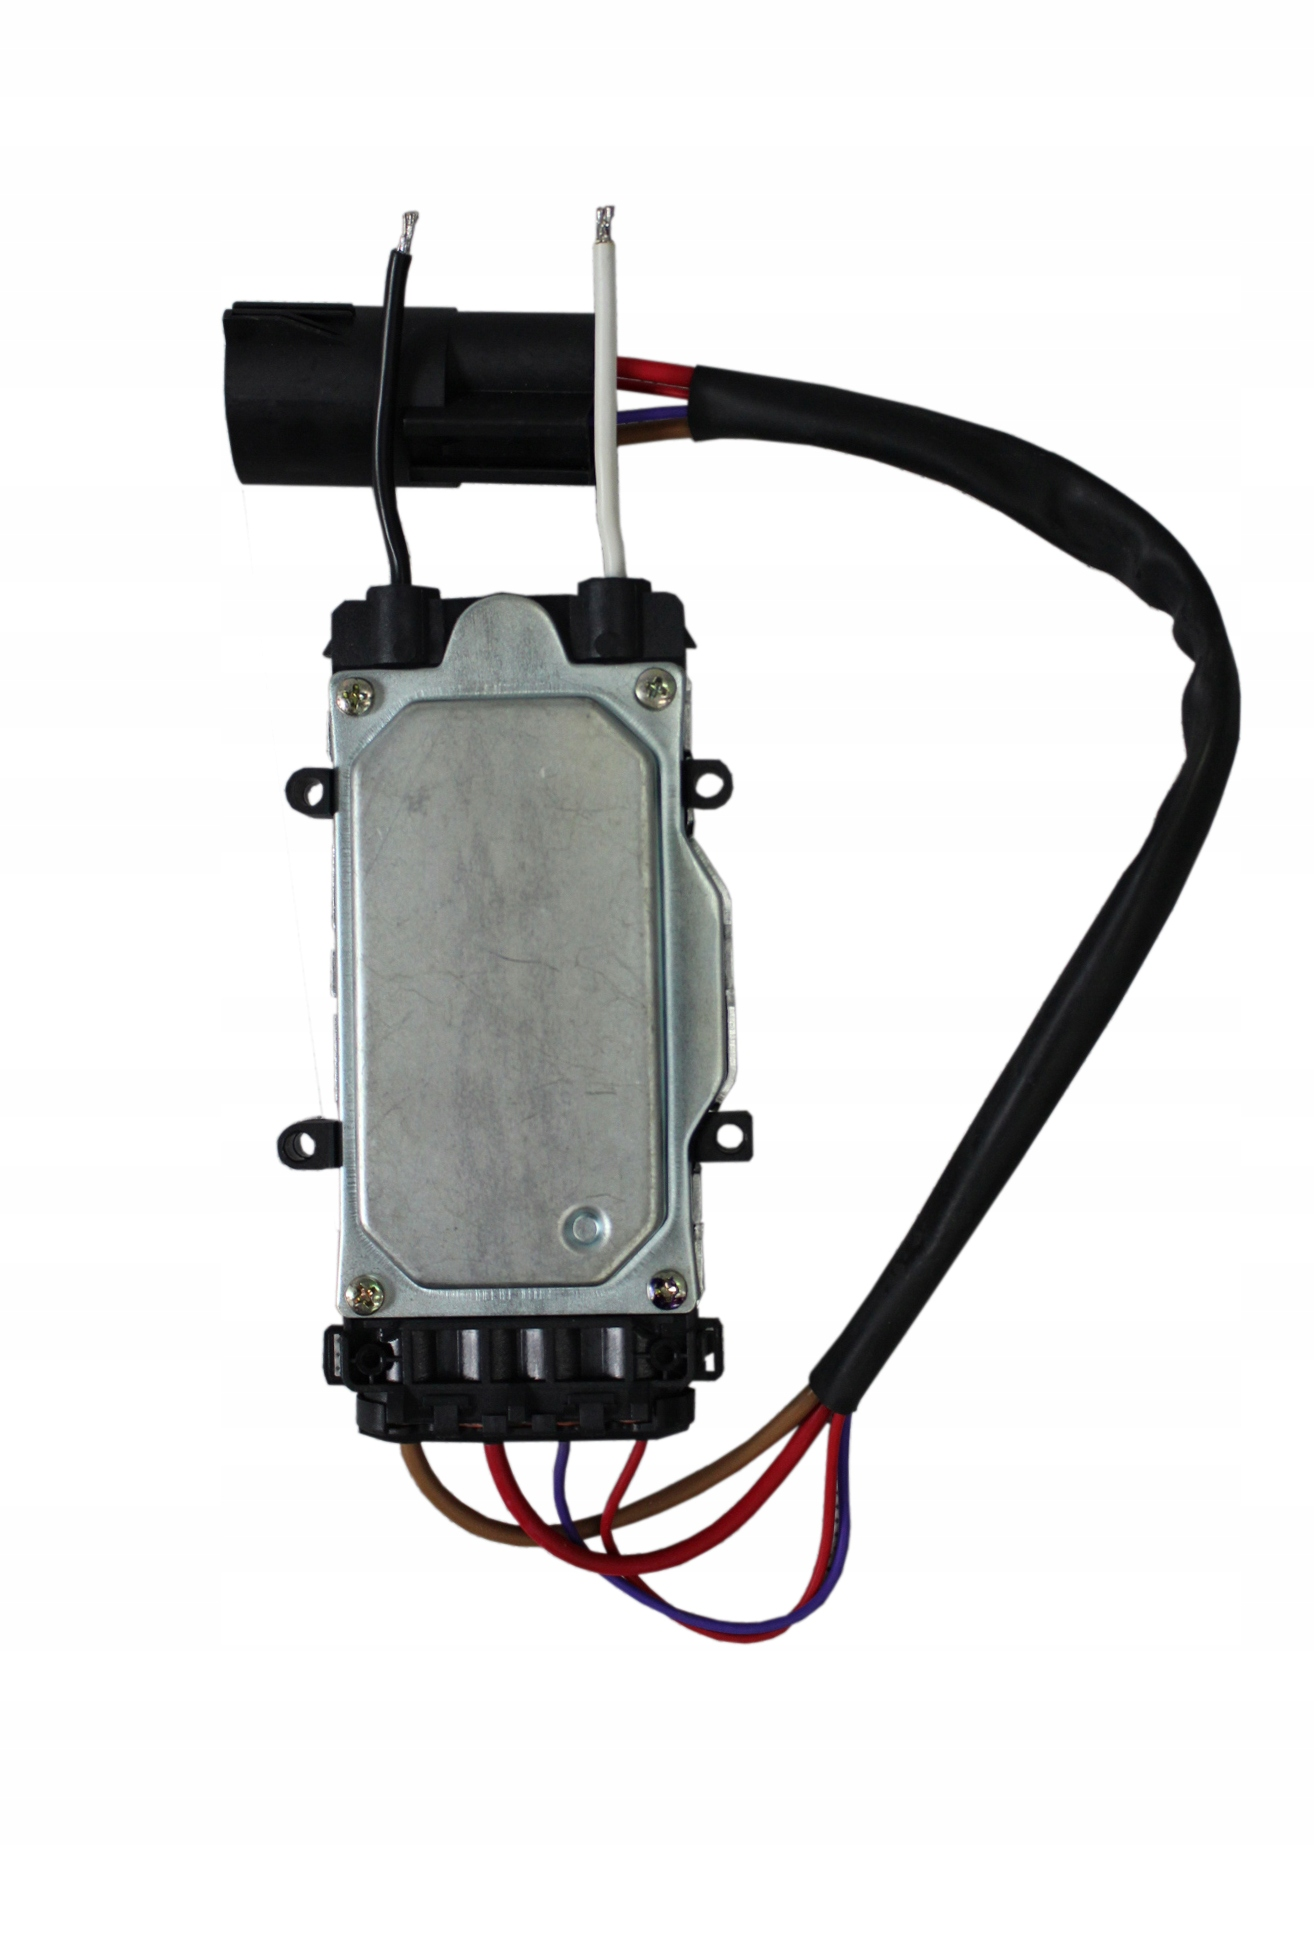 mercedes w169 a-class вентилятор модуль a169820354